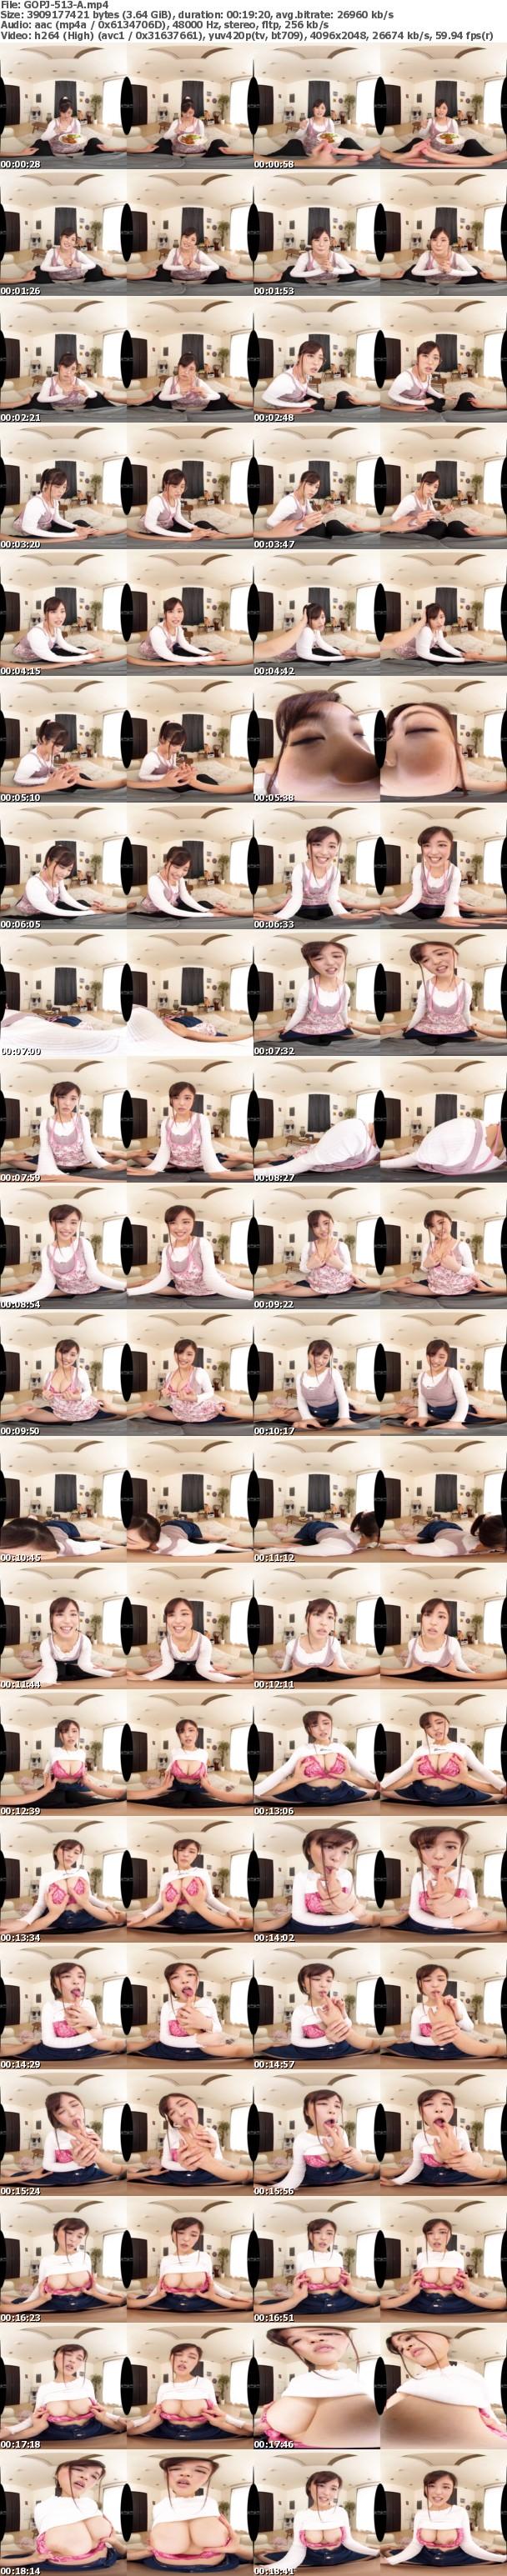 (VR) GOPJ-513 HQ 劇的超高画質 爆乳ゆるふわ女子 地味な彼女が初エッチで豹変!実は超エロい痴女だった!